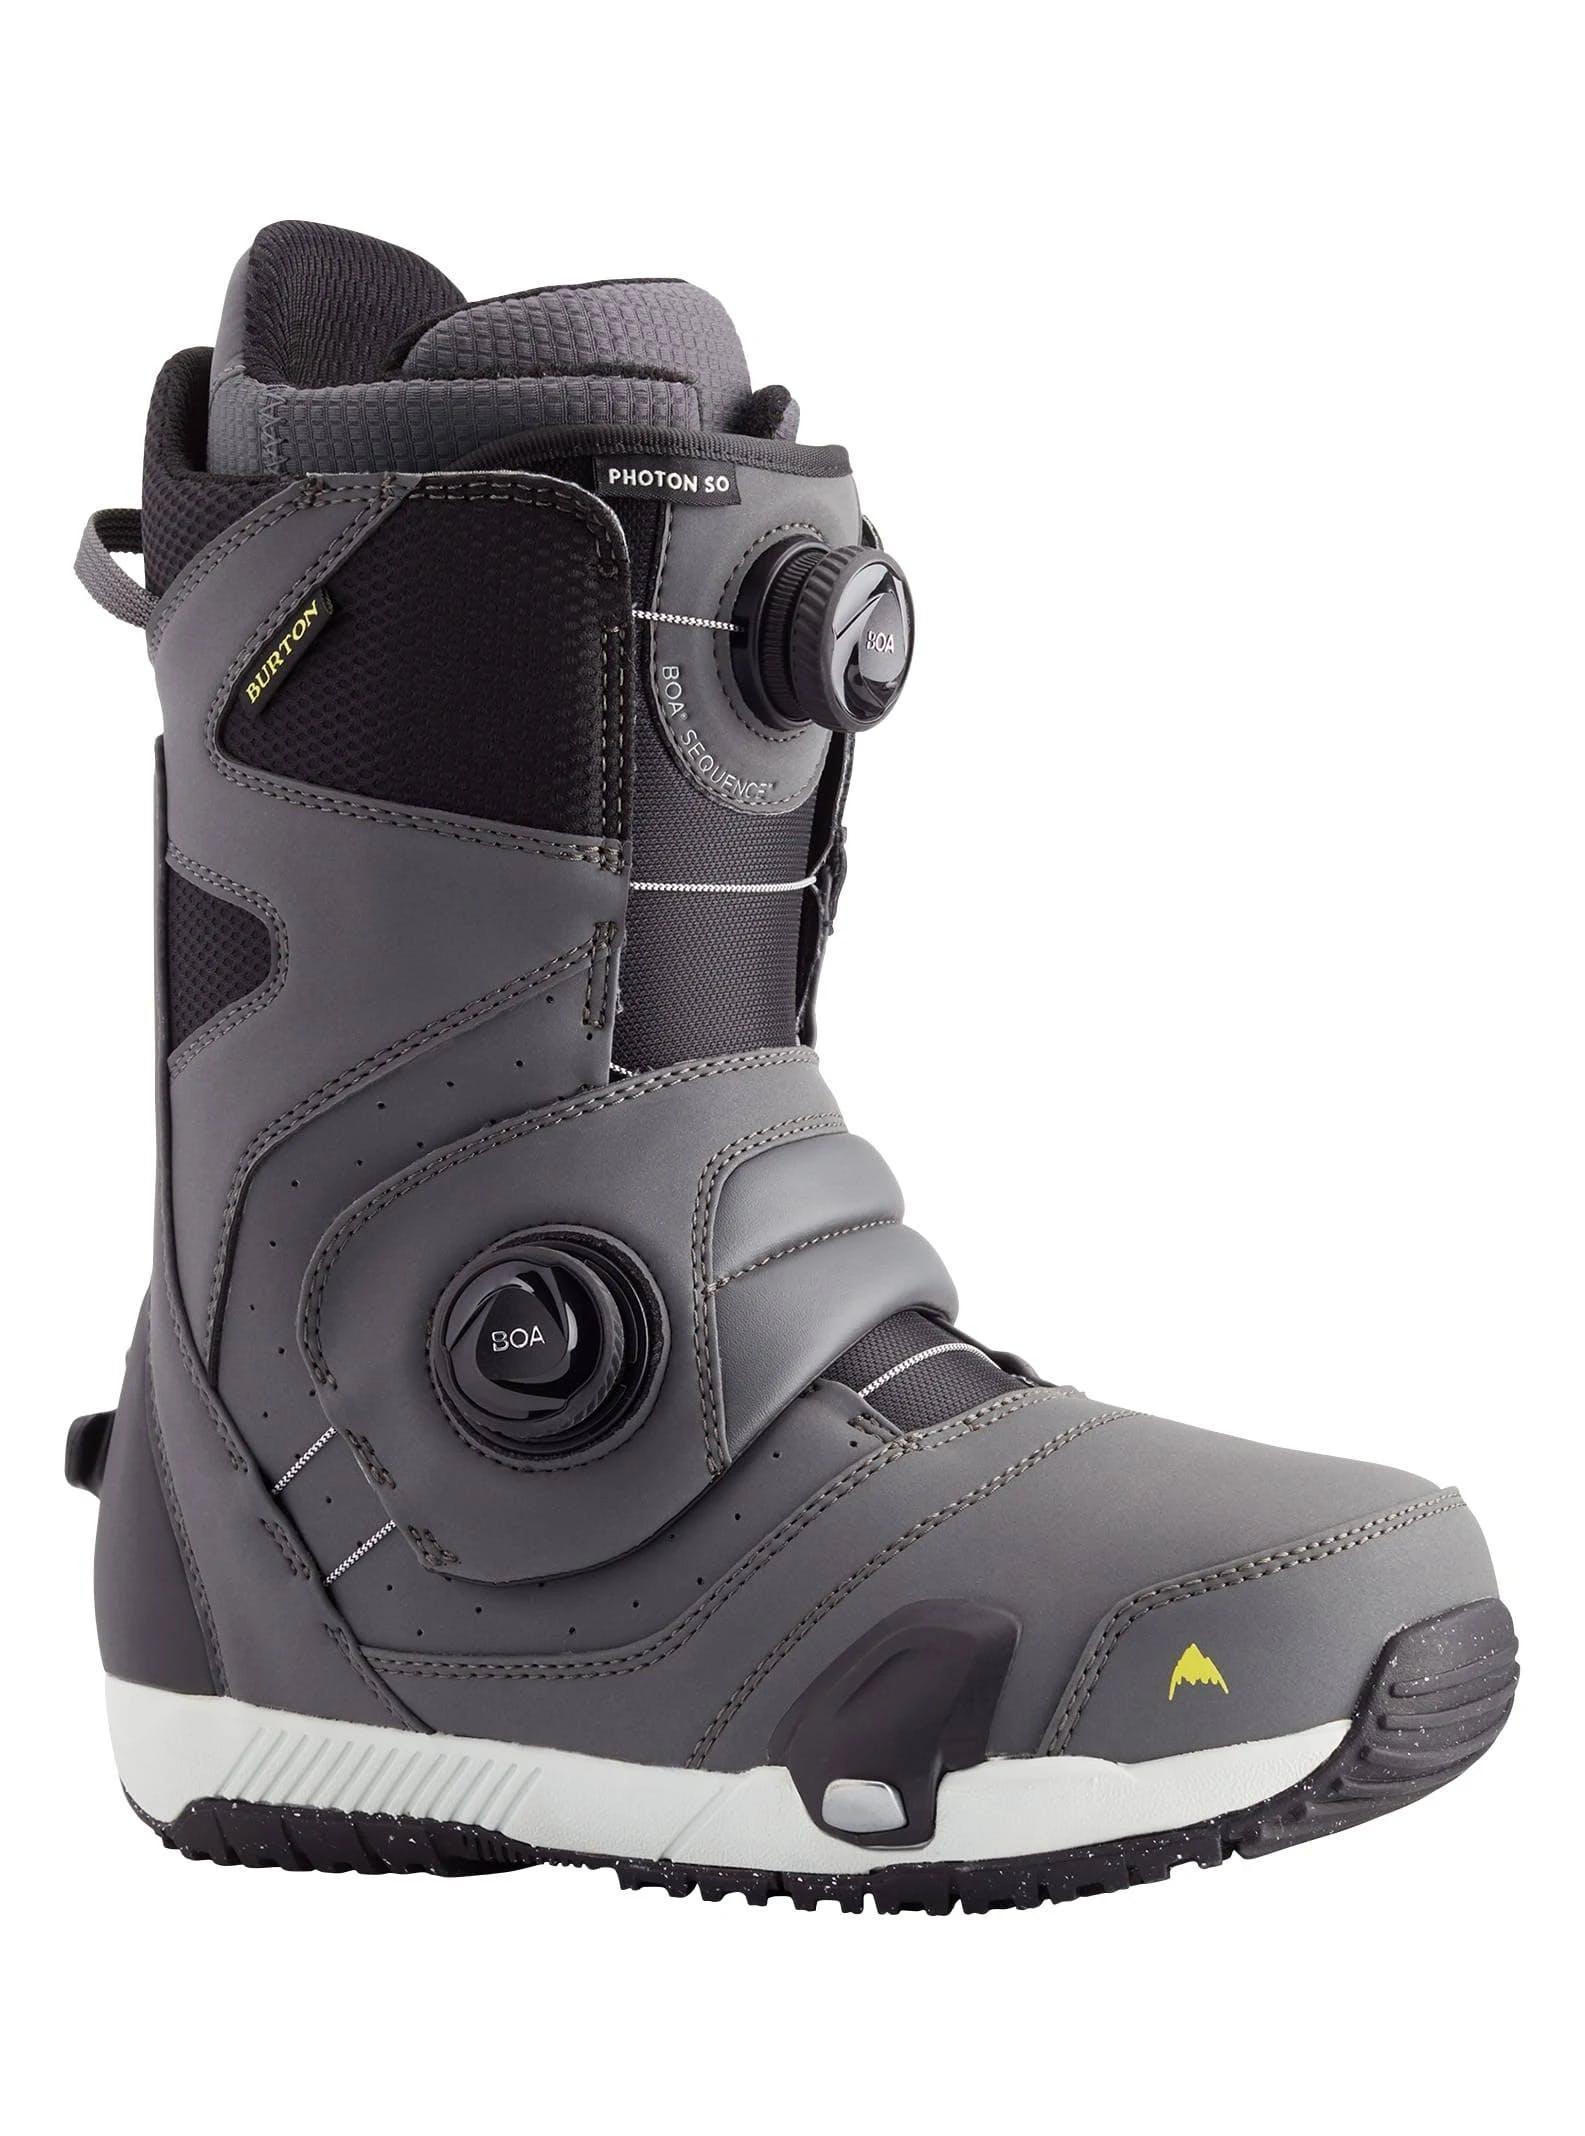 Burton Photon Step On Snowboard Boots · 2021